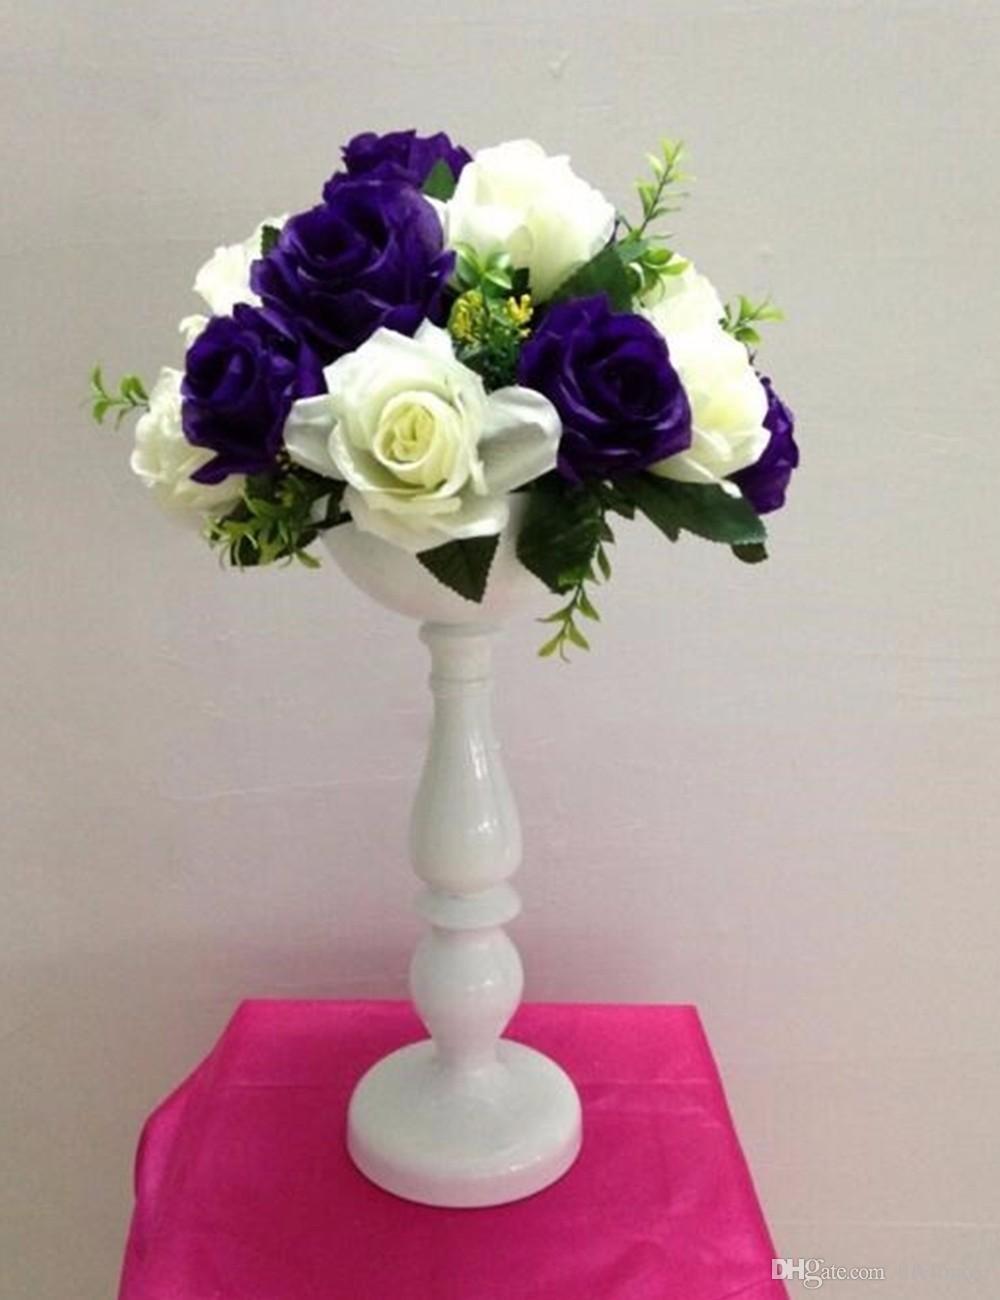 DHgate.com & Elegant 37 Cm Height White Metal Flower Vases Wedding Table Flower Vase For Wedding Centerpieces Decoratings Vase Home Decor Vase Large From ...